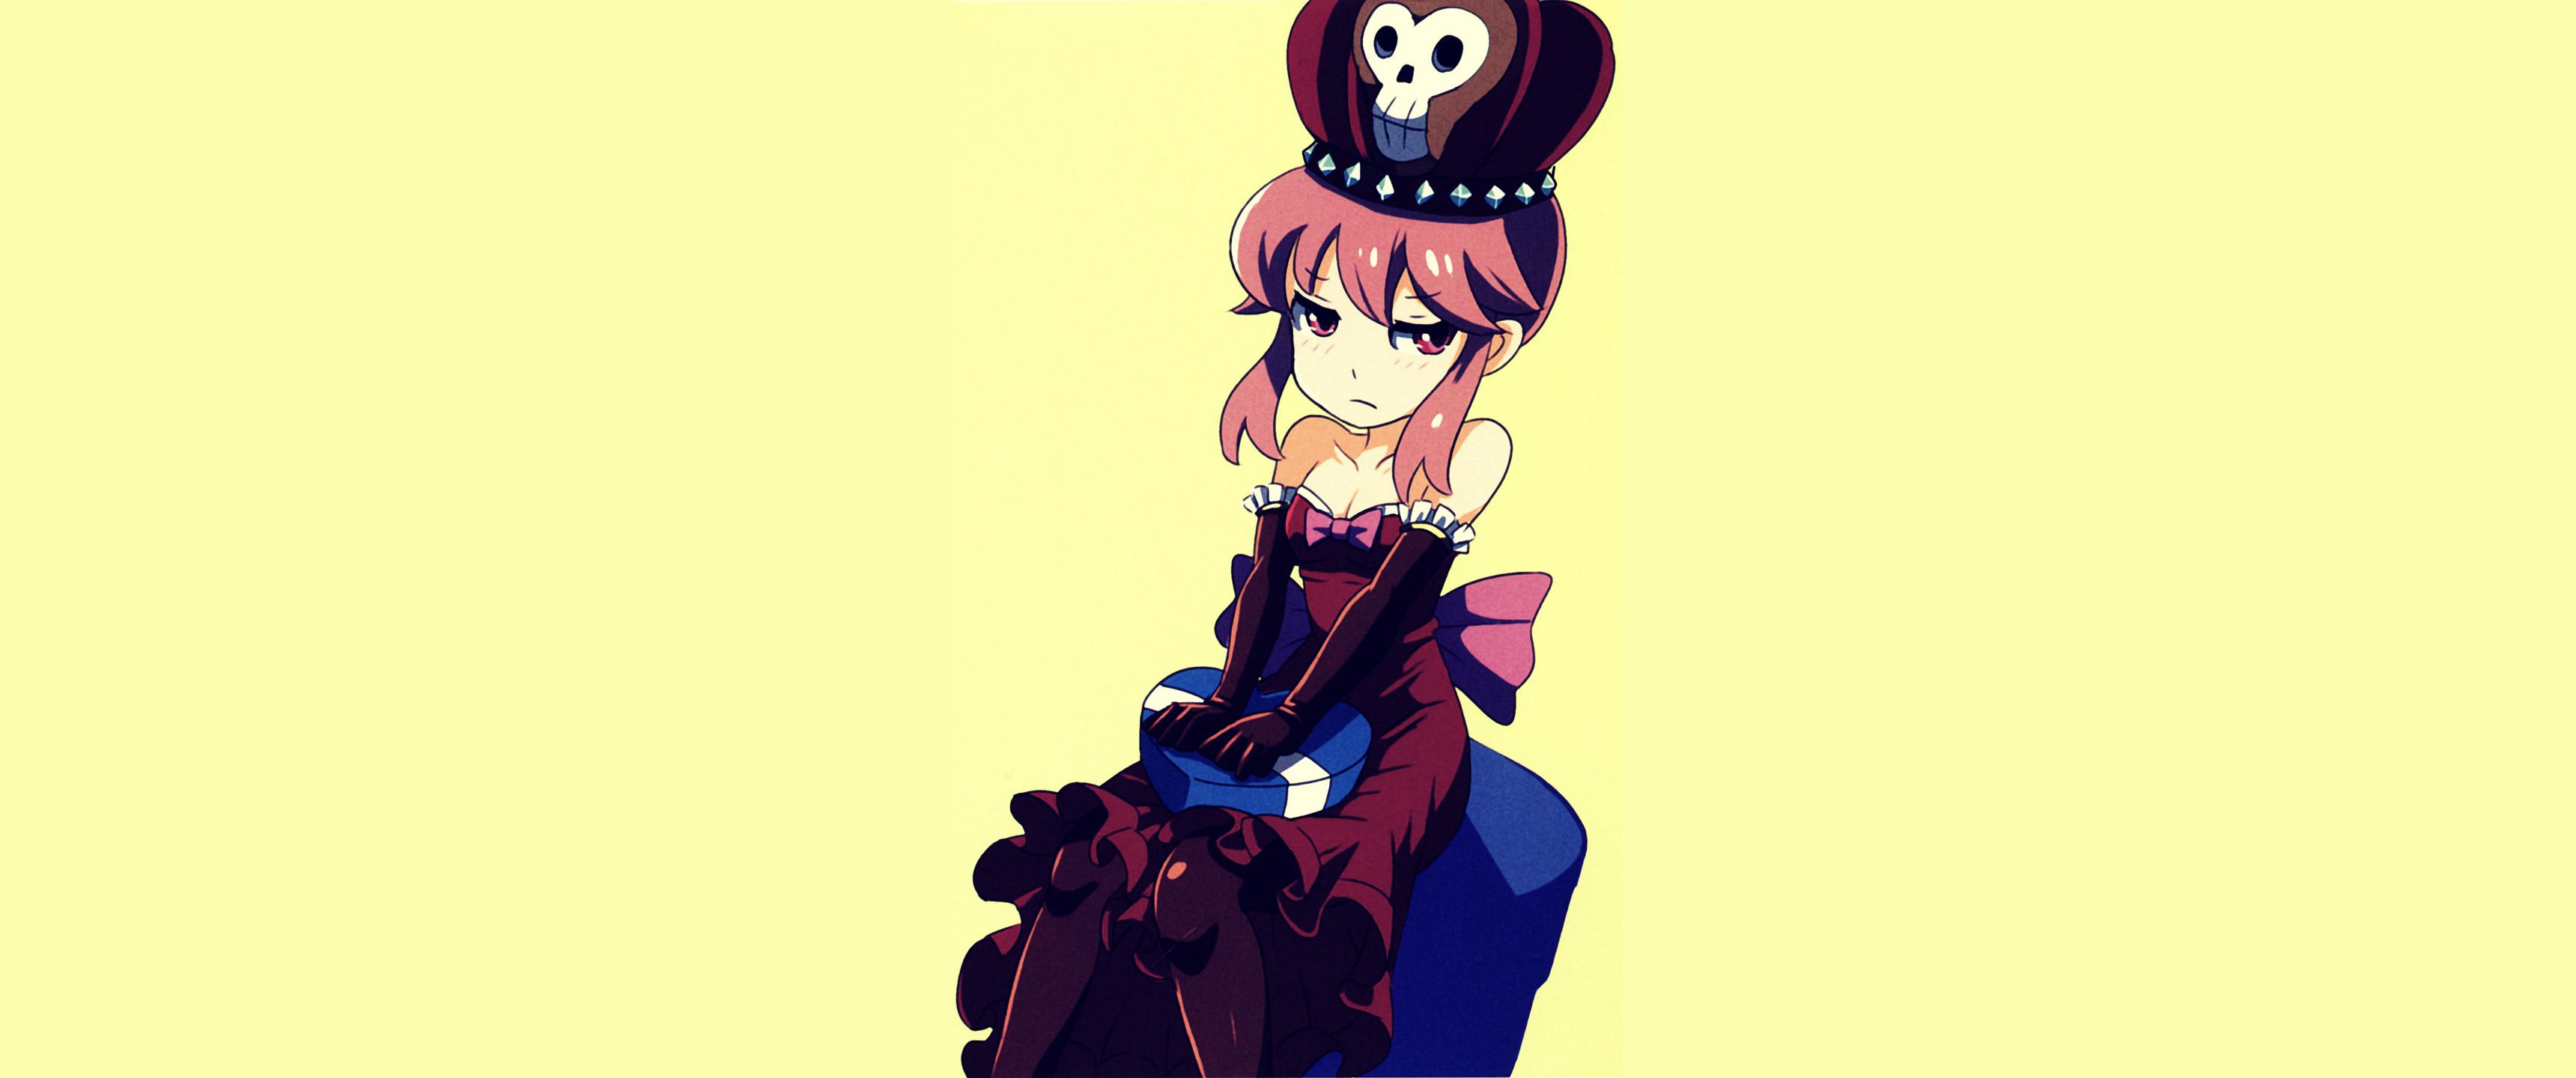 Anime Kill La Kill Jakuzure Nonon Music Manga Wallpaper Resolution 3440x1440 Id Wallha Com